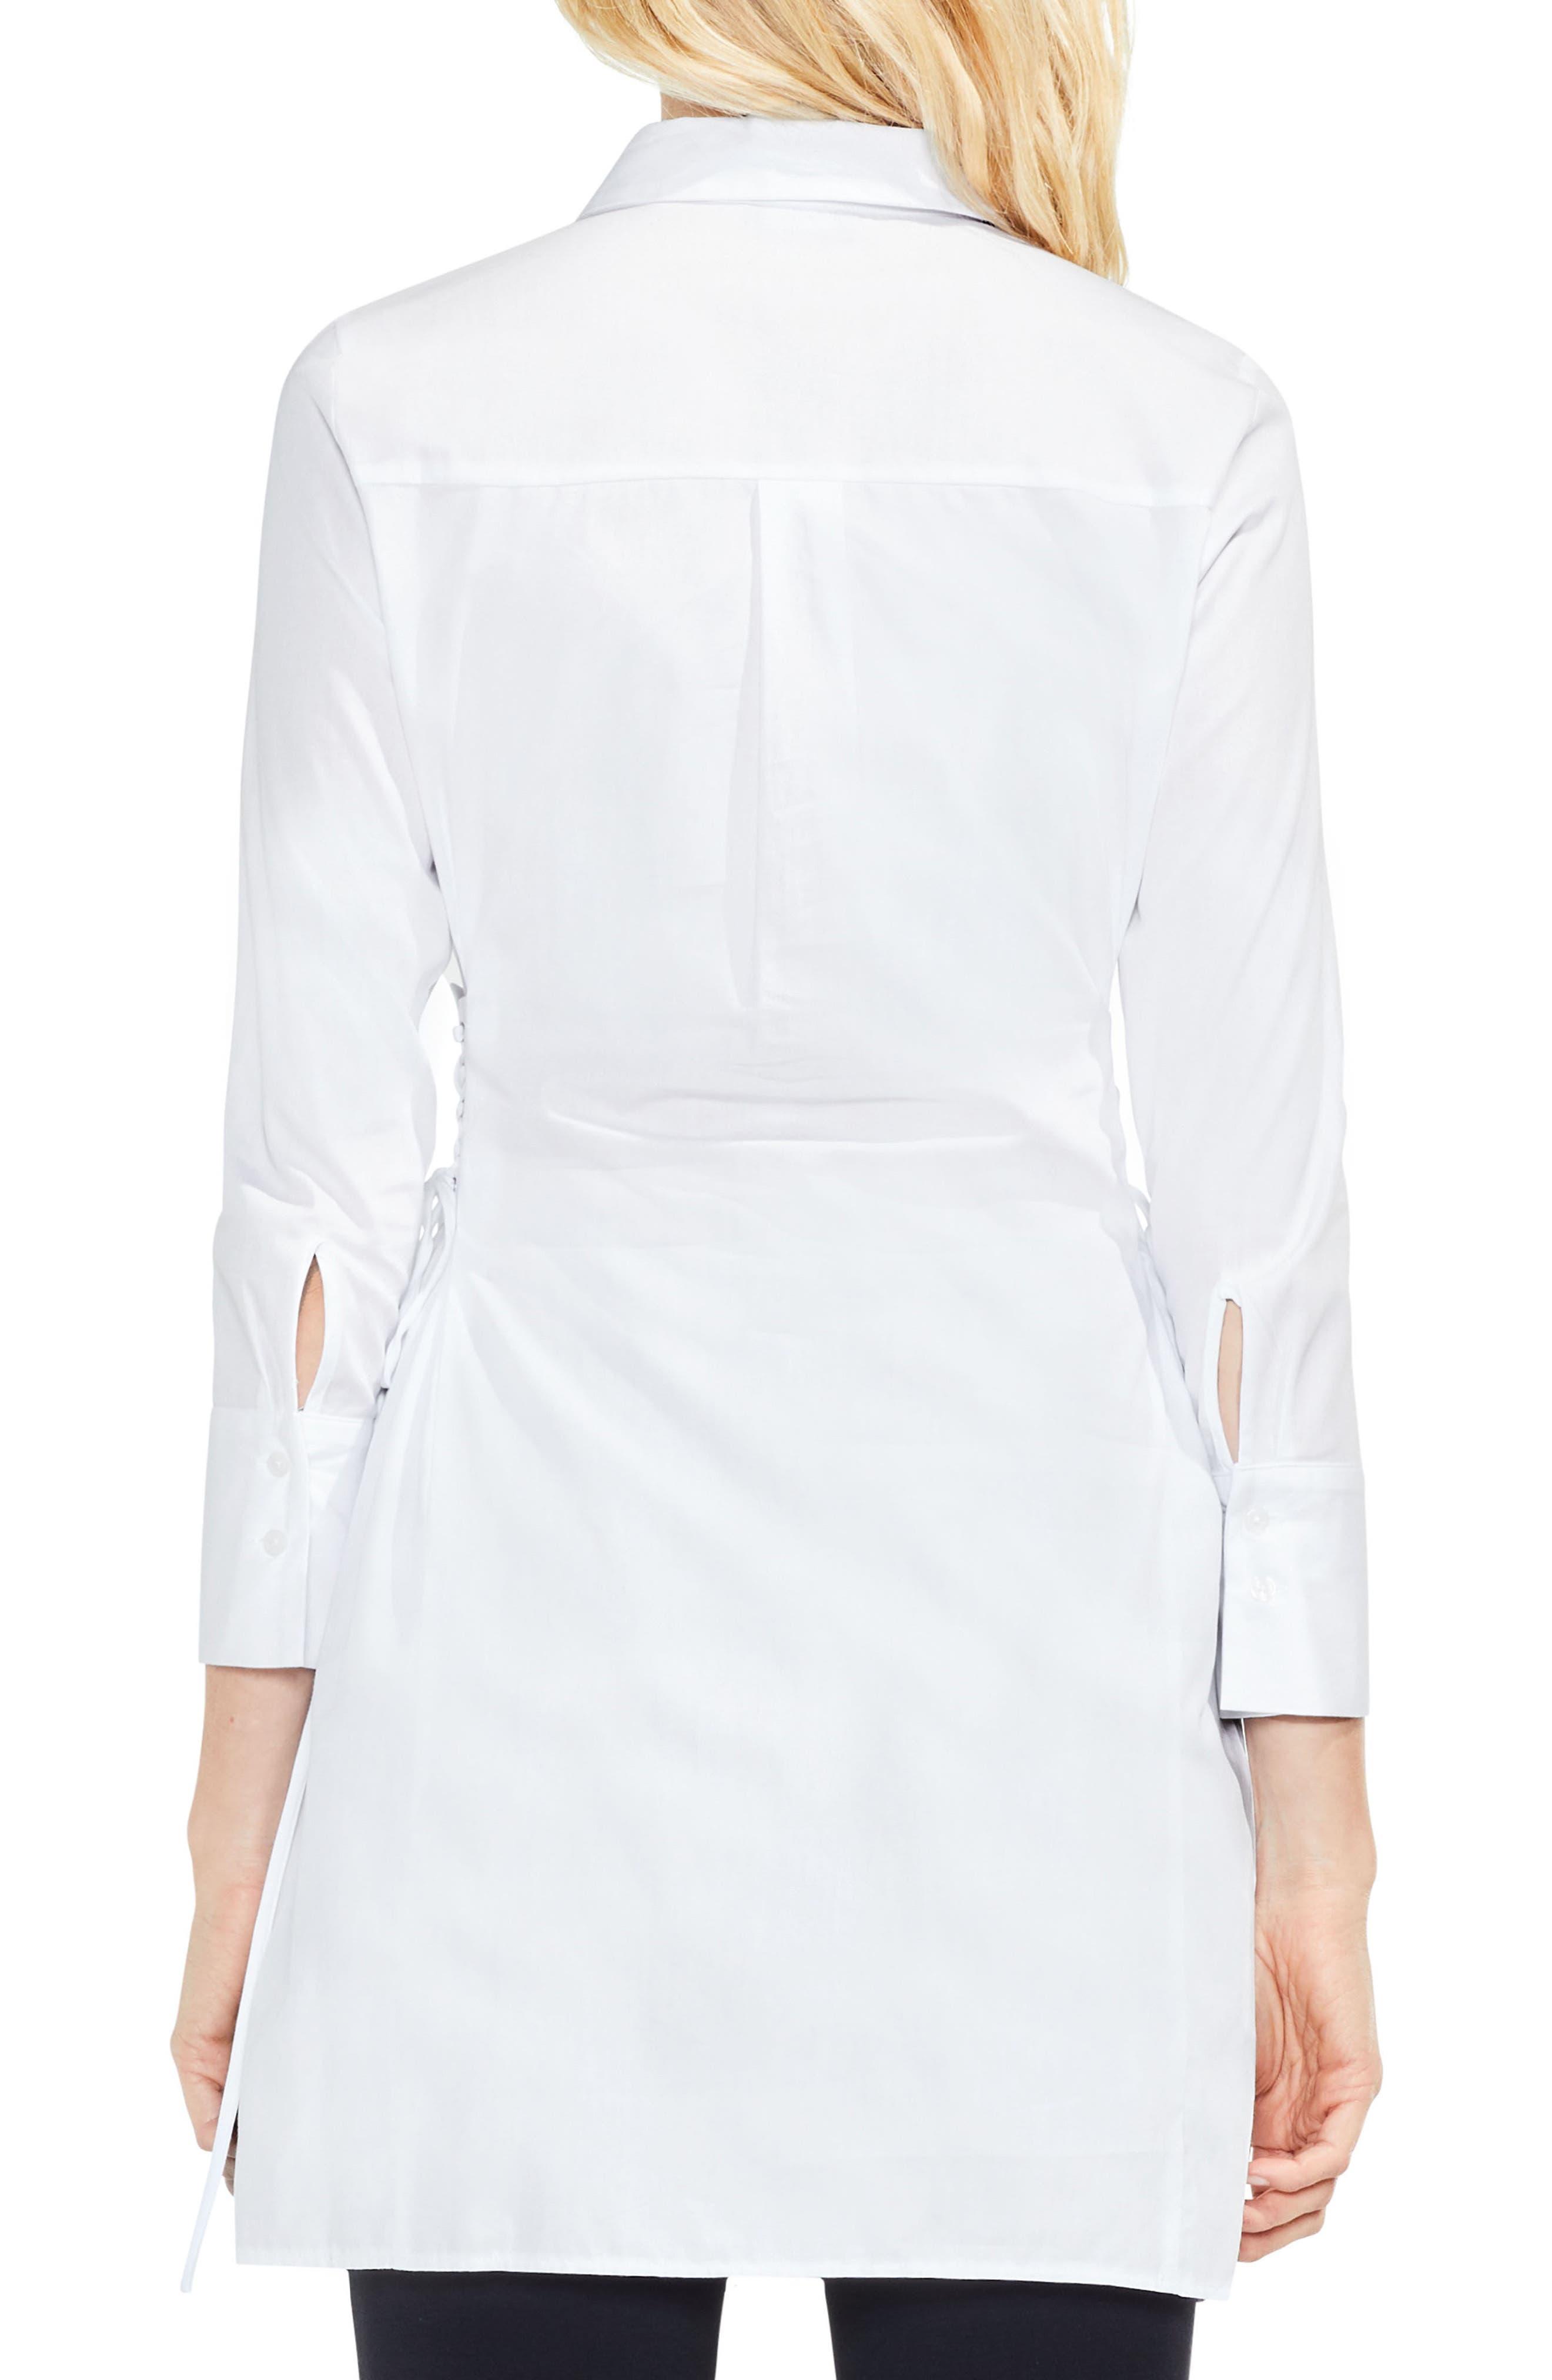 Alternate Image 2  - Vince Camuto Side Lace-Up Tunic Shirt